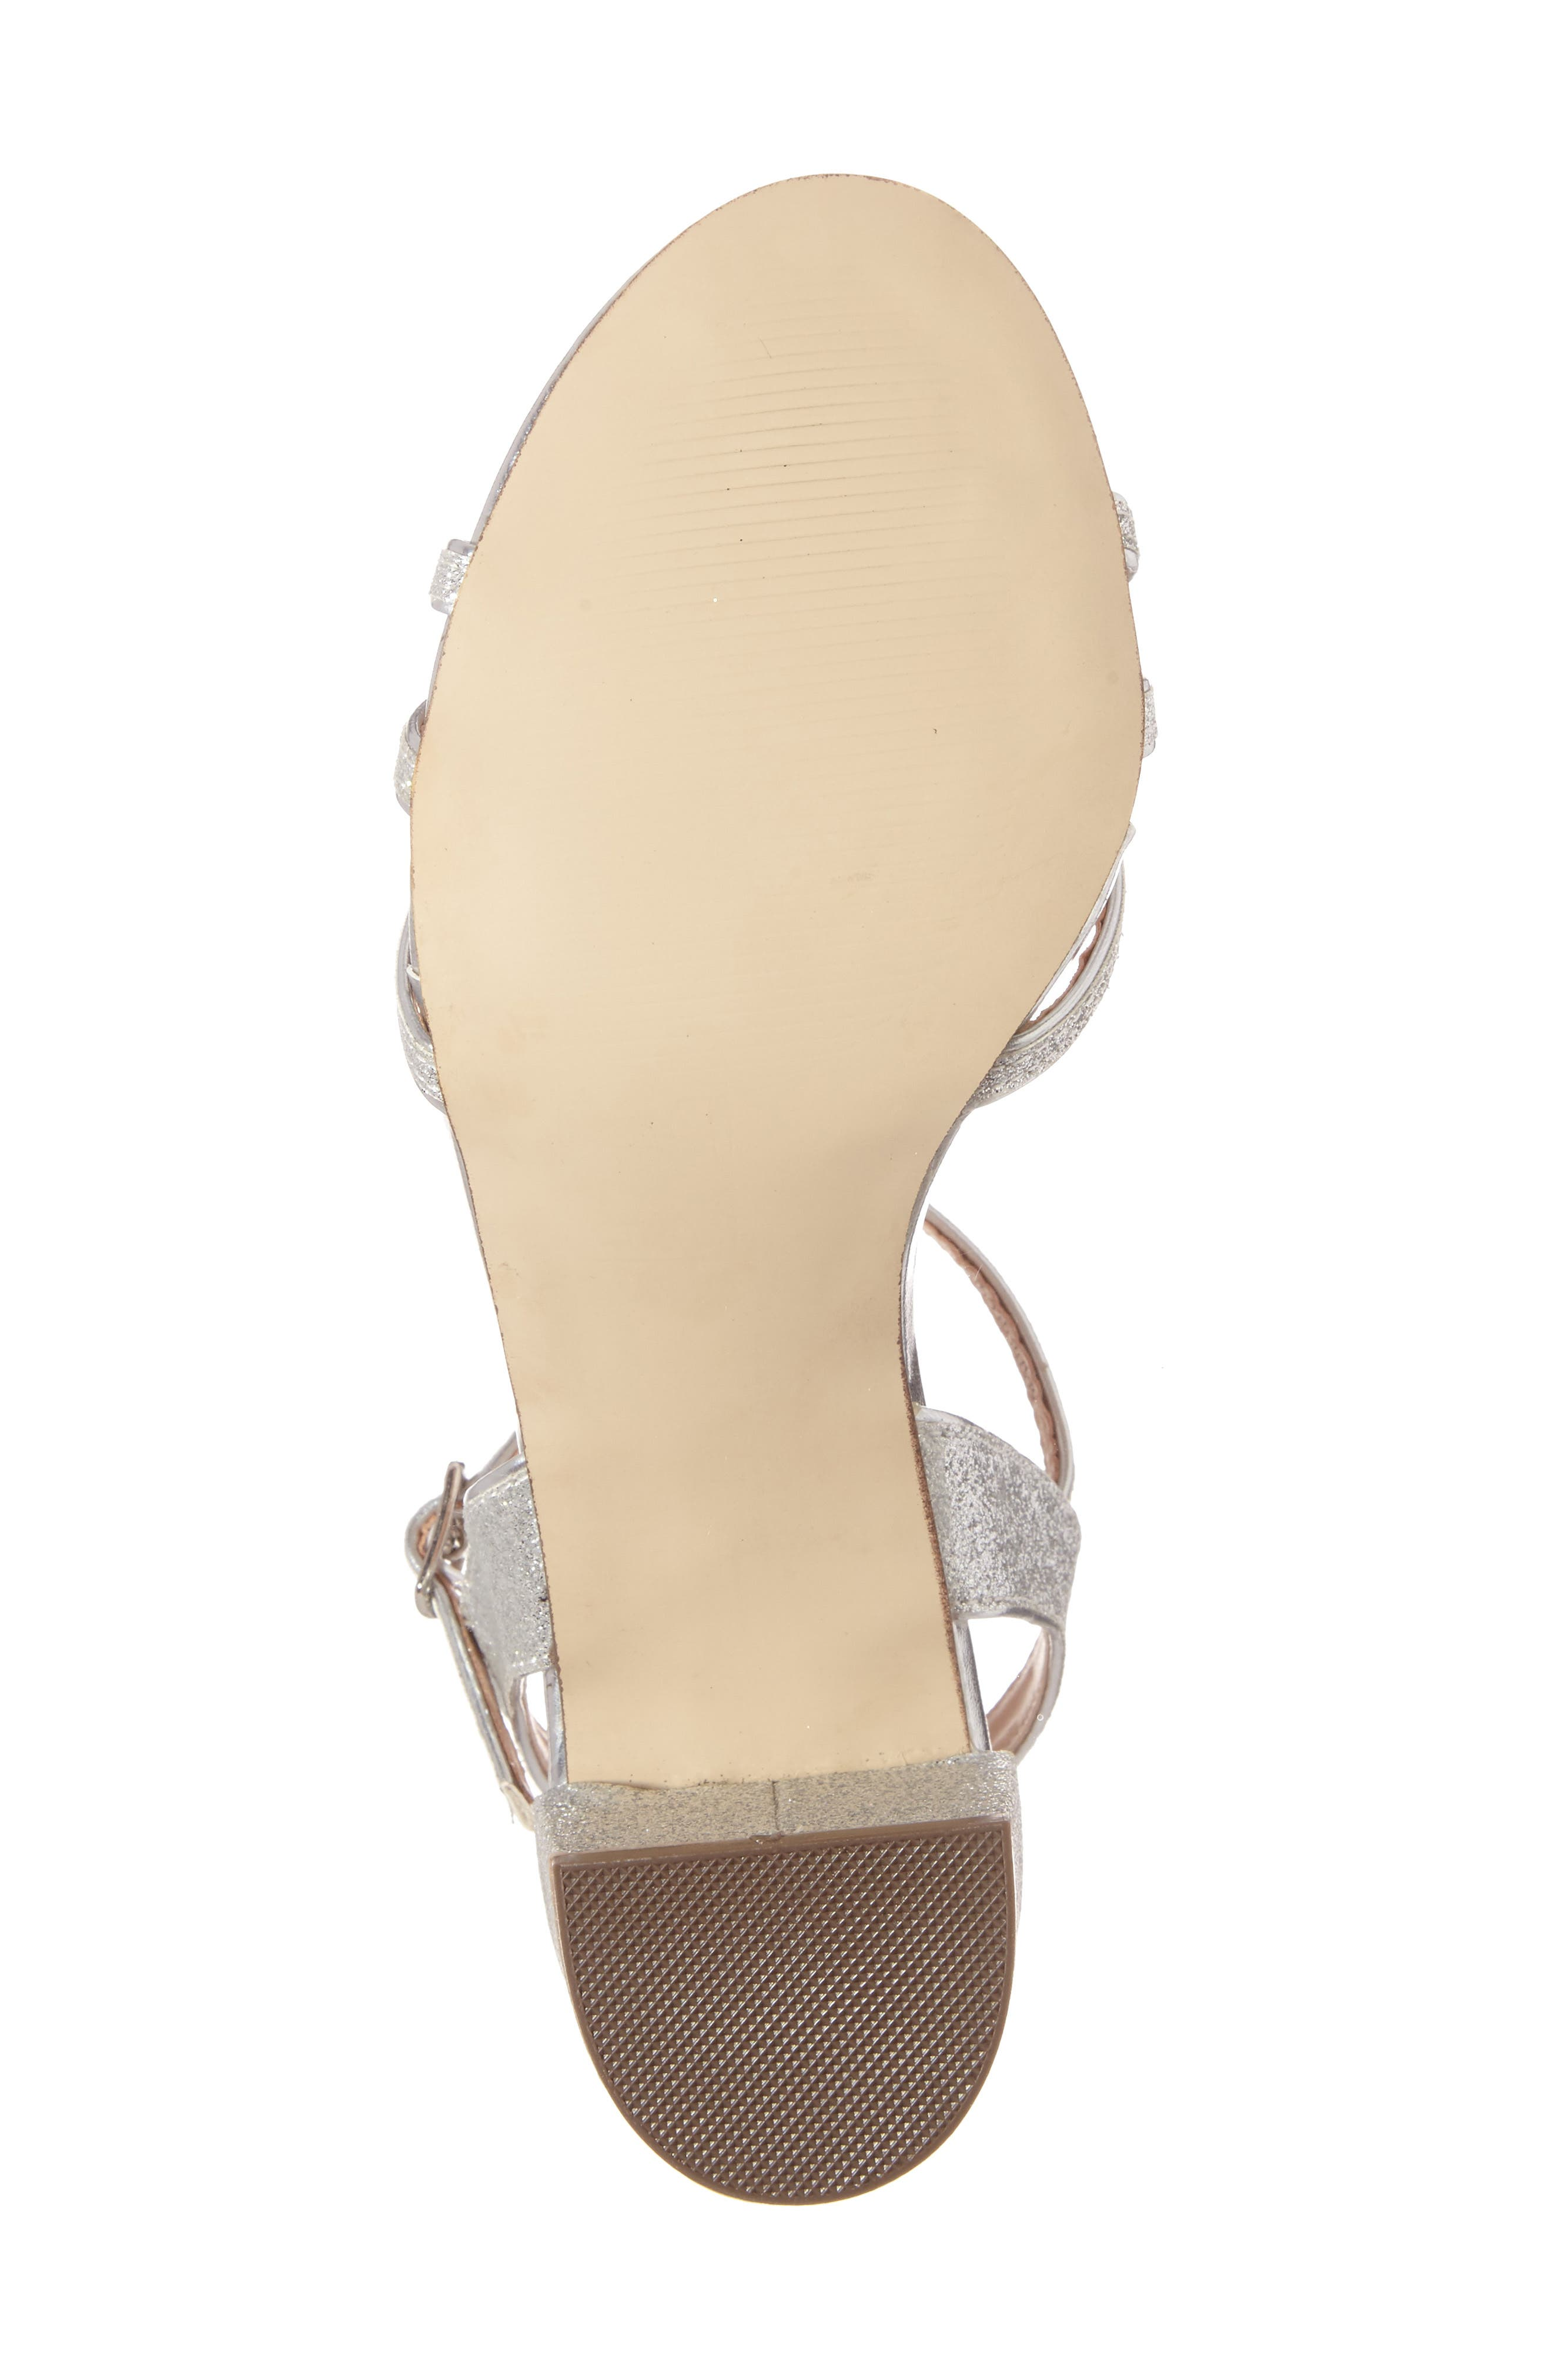 Sadie T-Strap Sandal,                             Alternate thumbnail 4, color,                             040